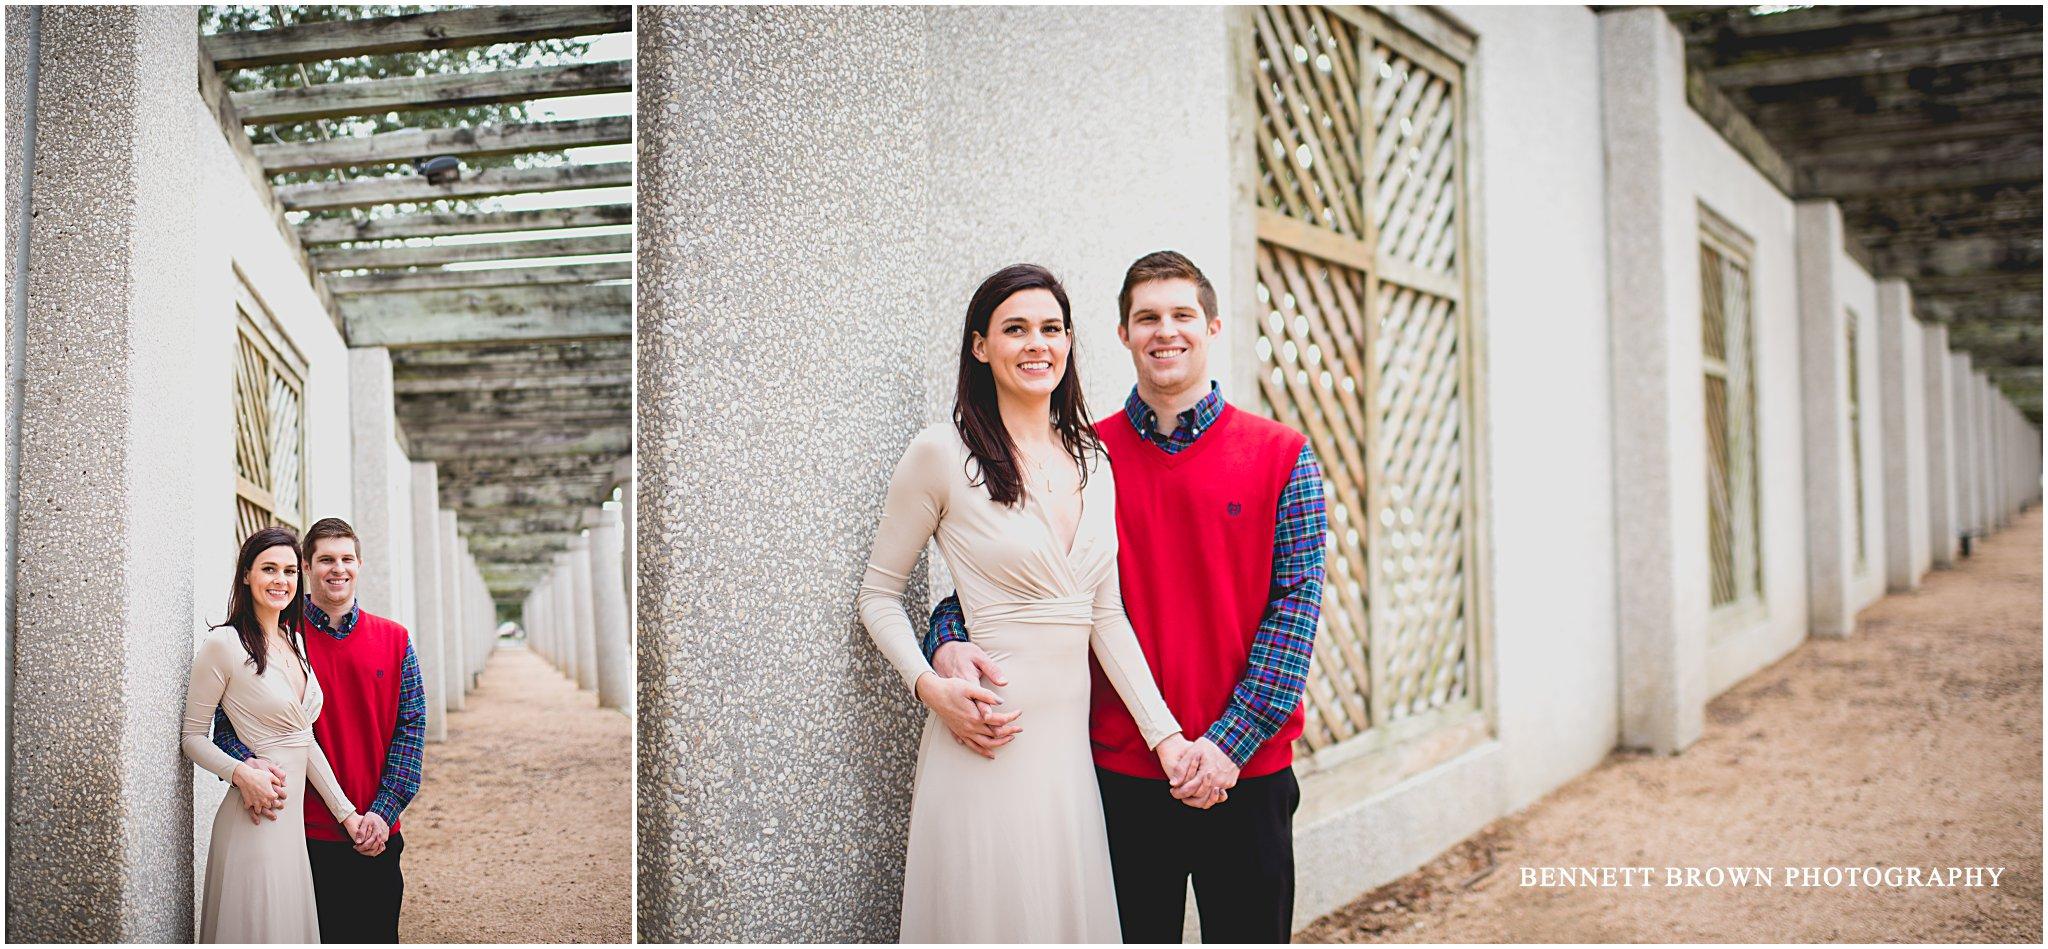 Bennett Brown Photography Detail shoot Wedding photographer Houston Texas Engagement